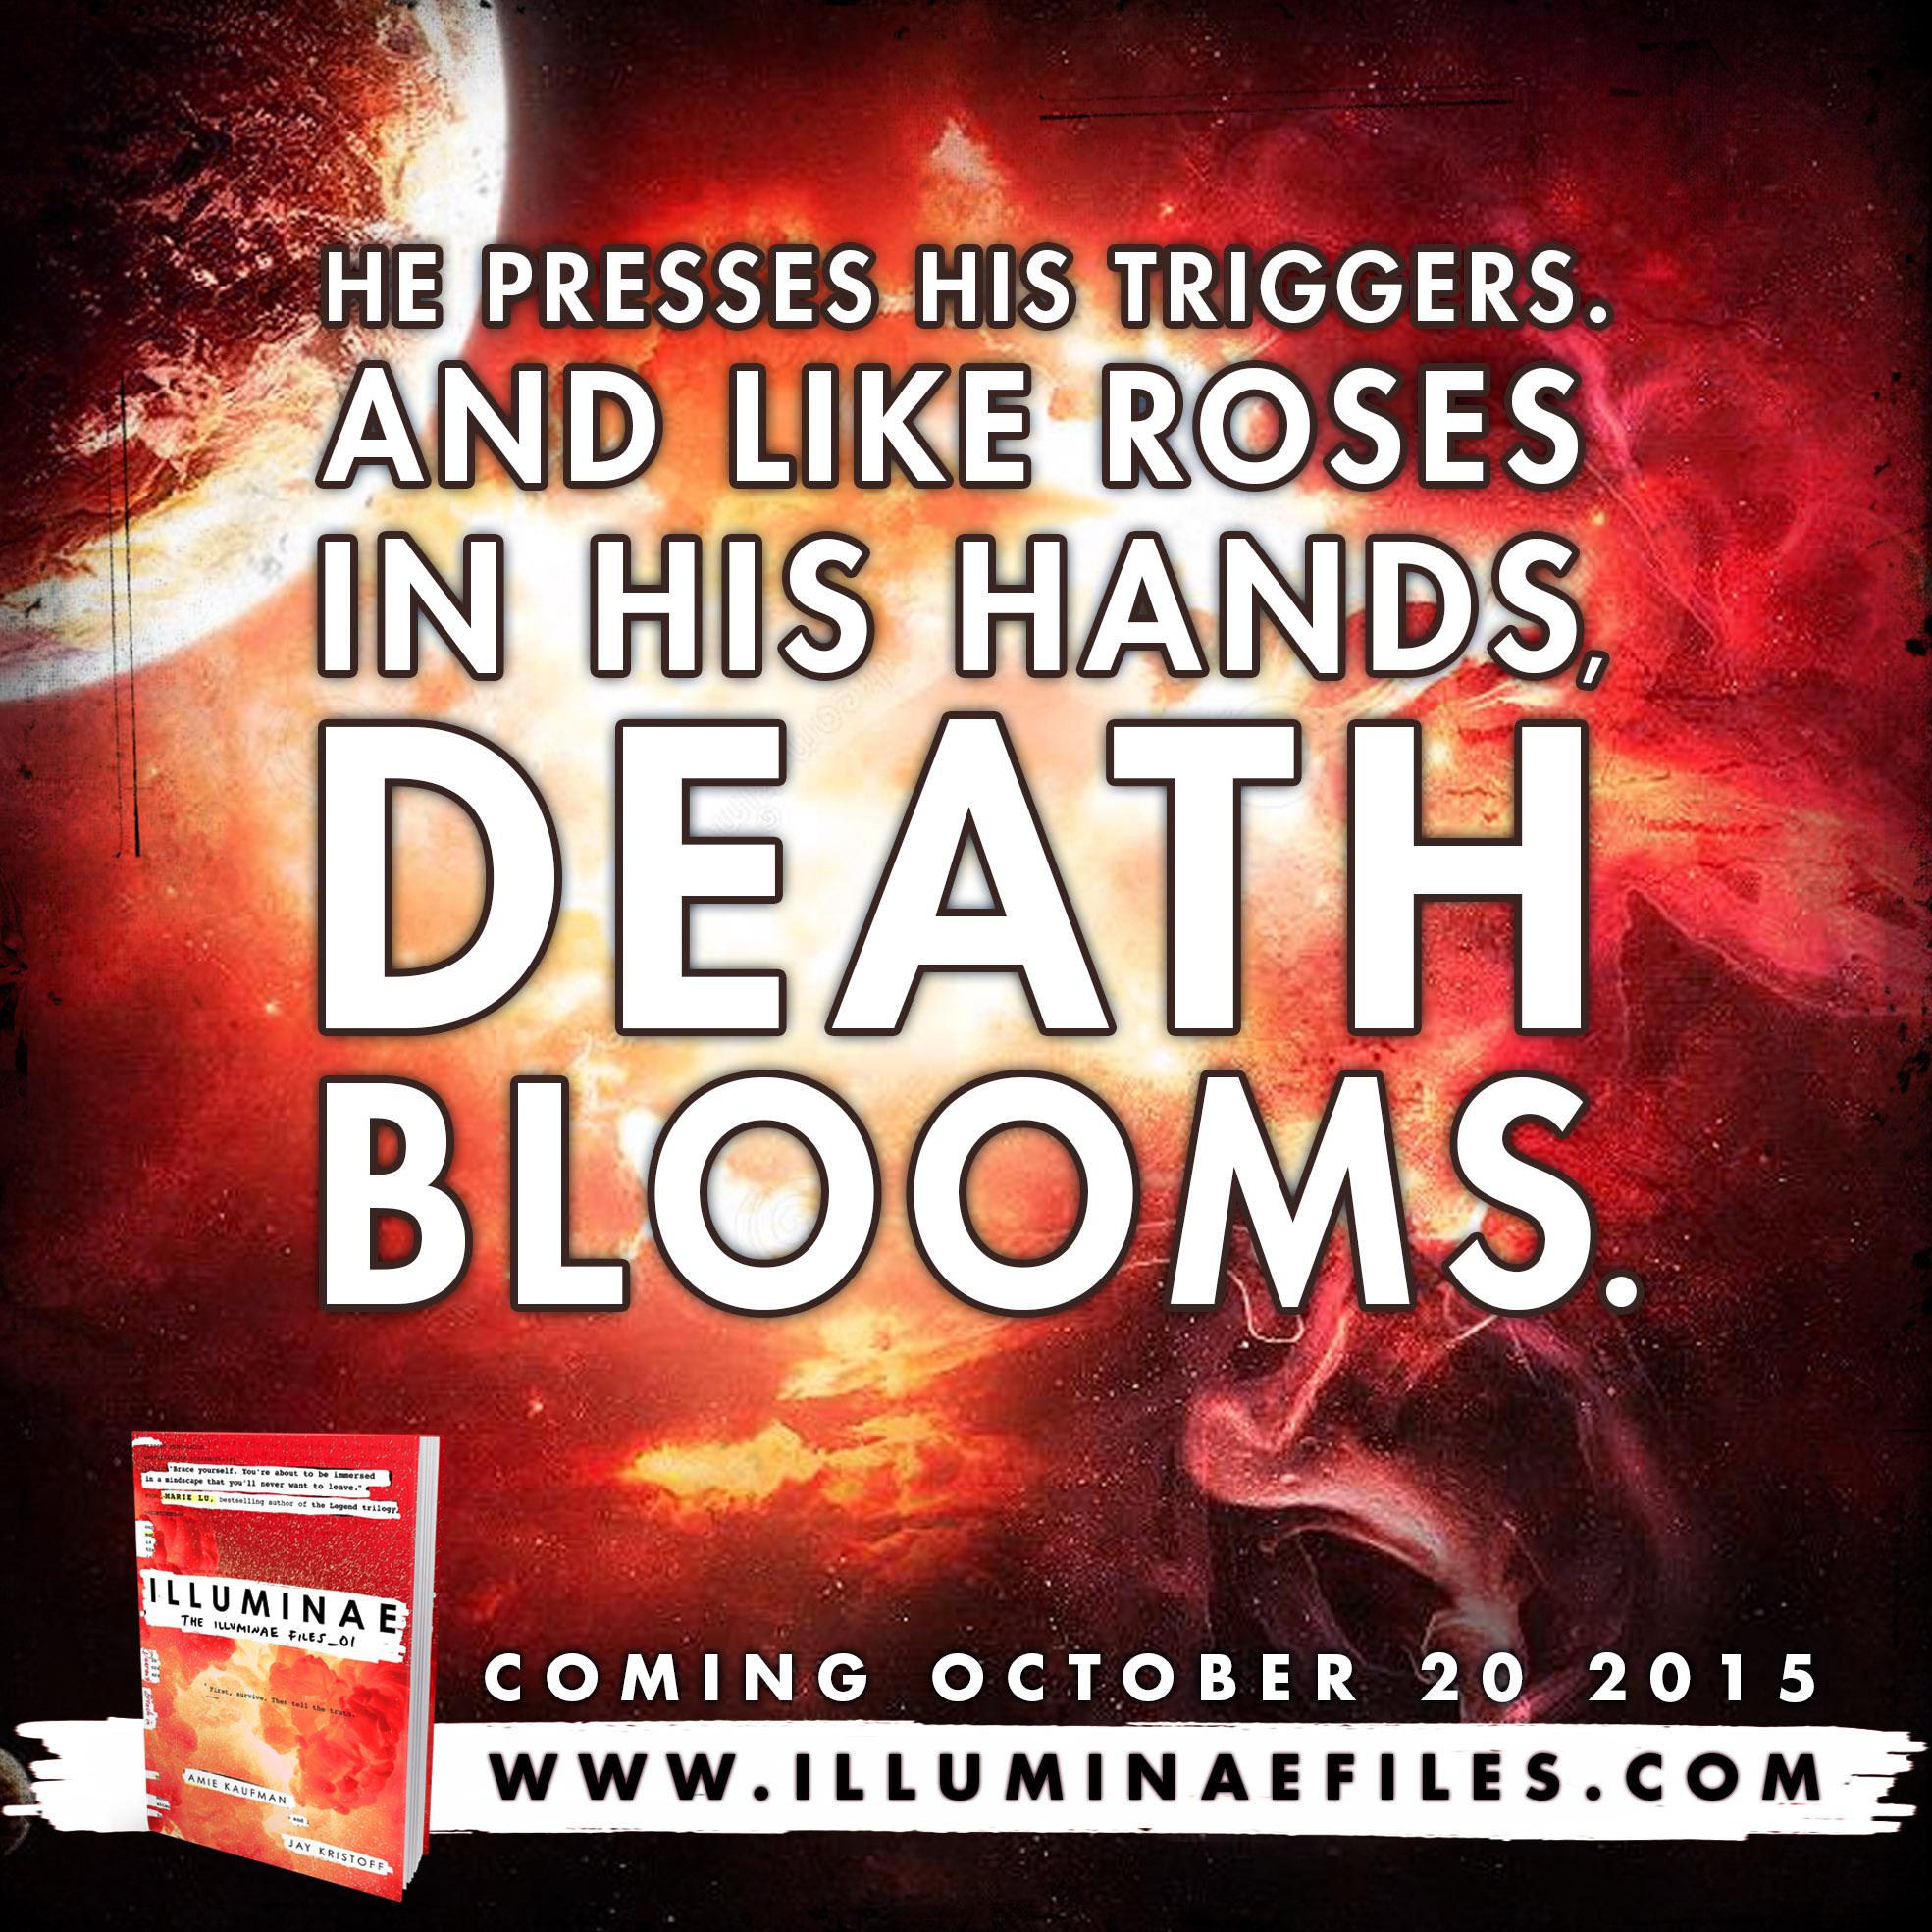 deathblooms